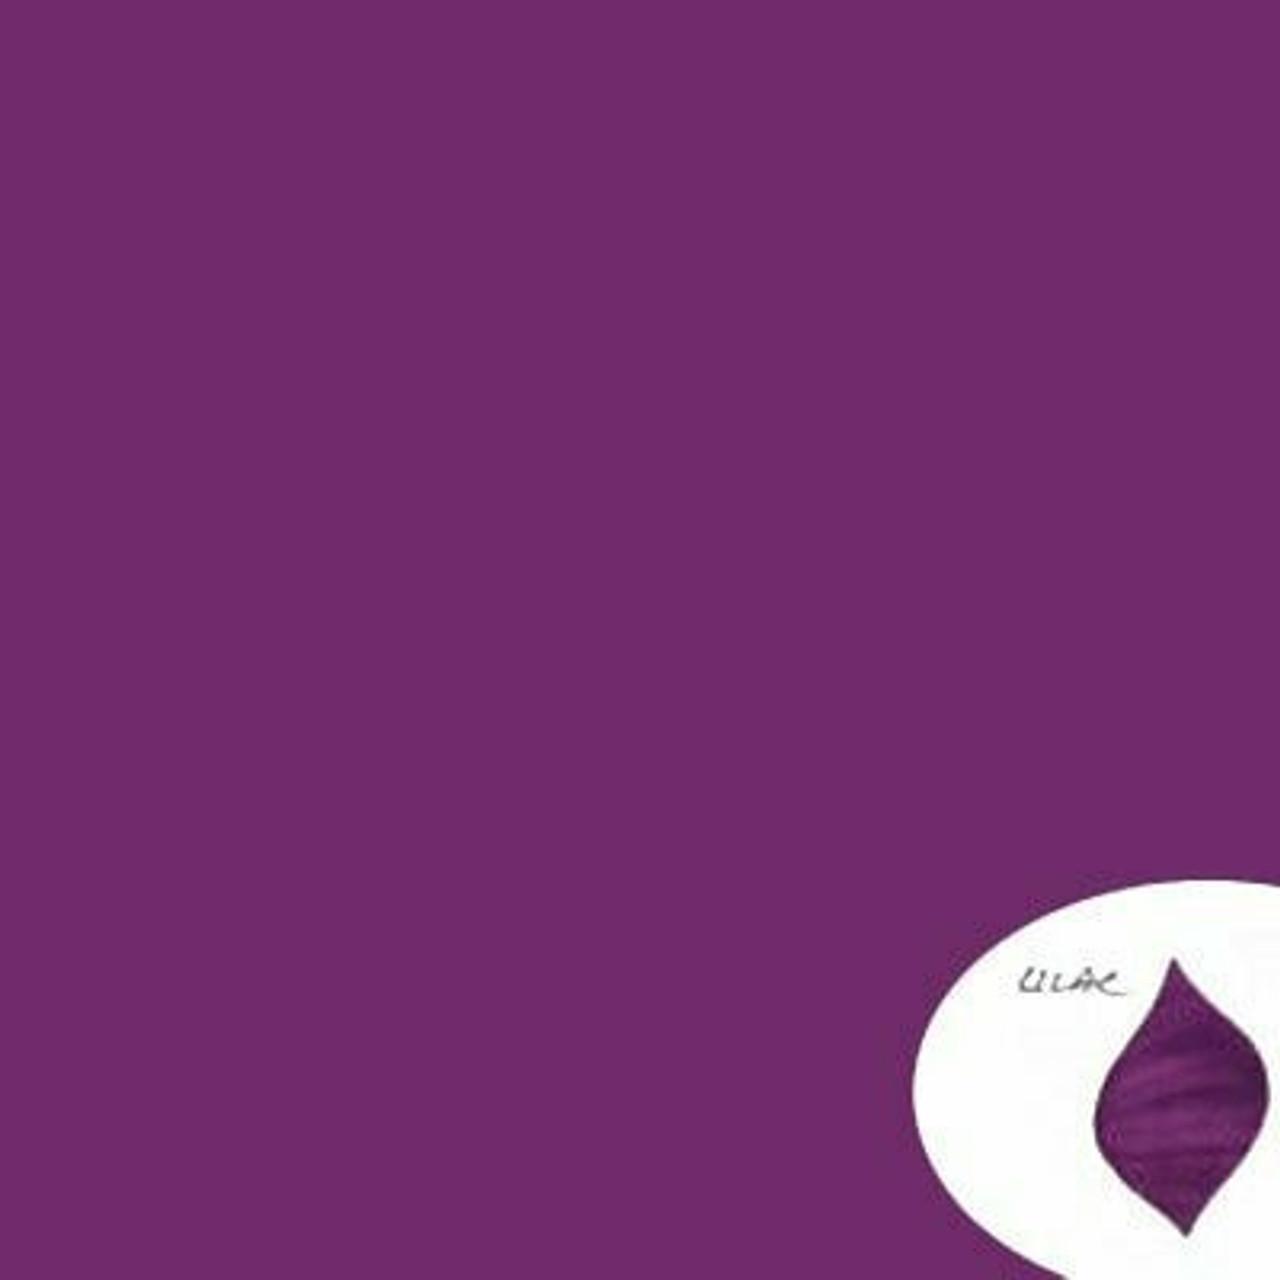 Underglaze Purple 100g Cone 06-10 UPUR2.1